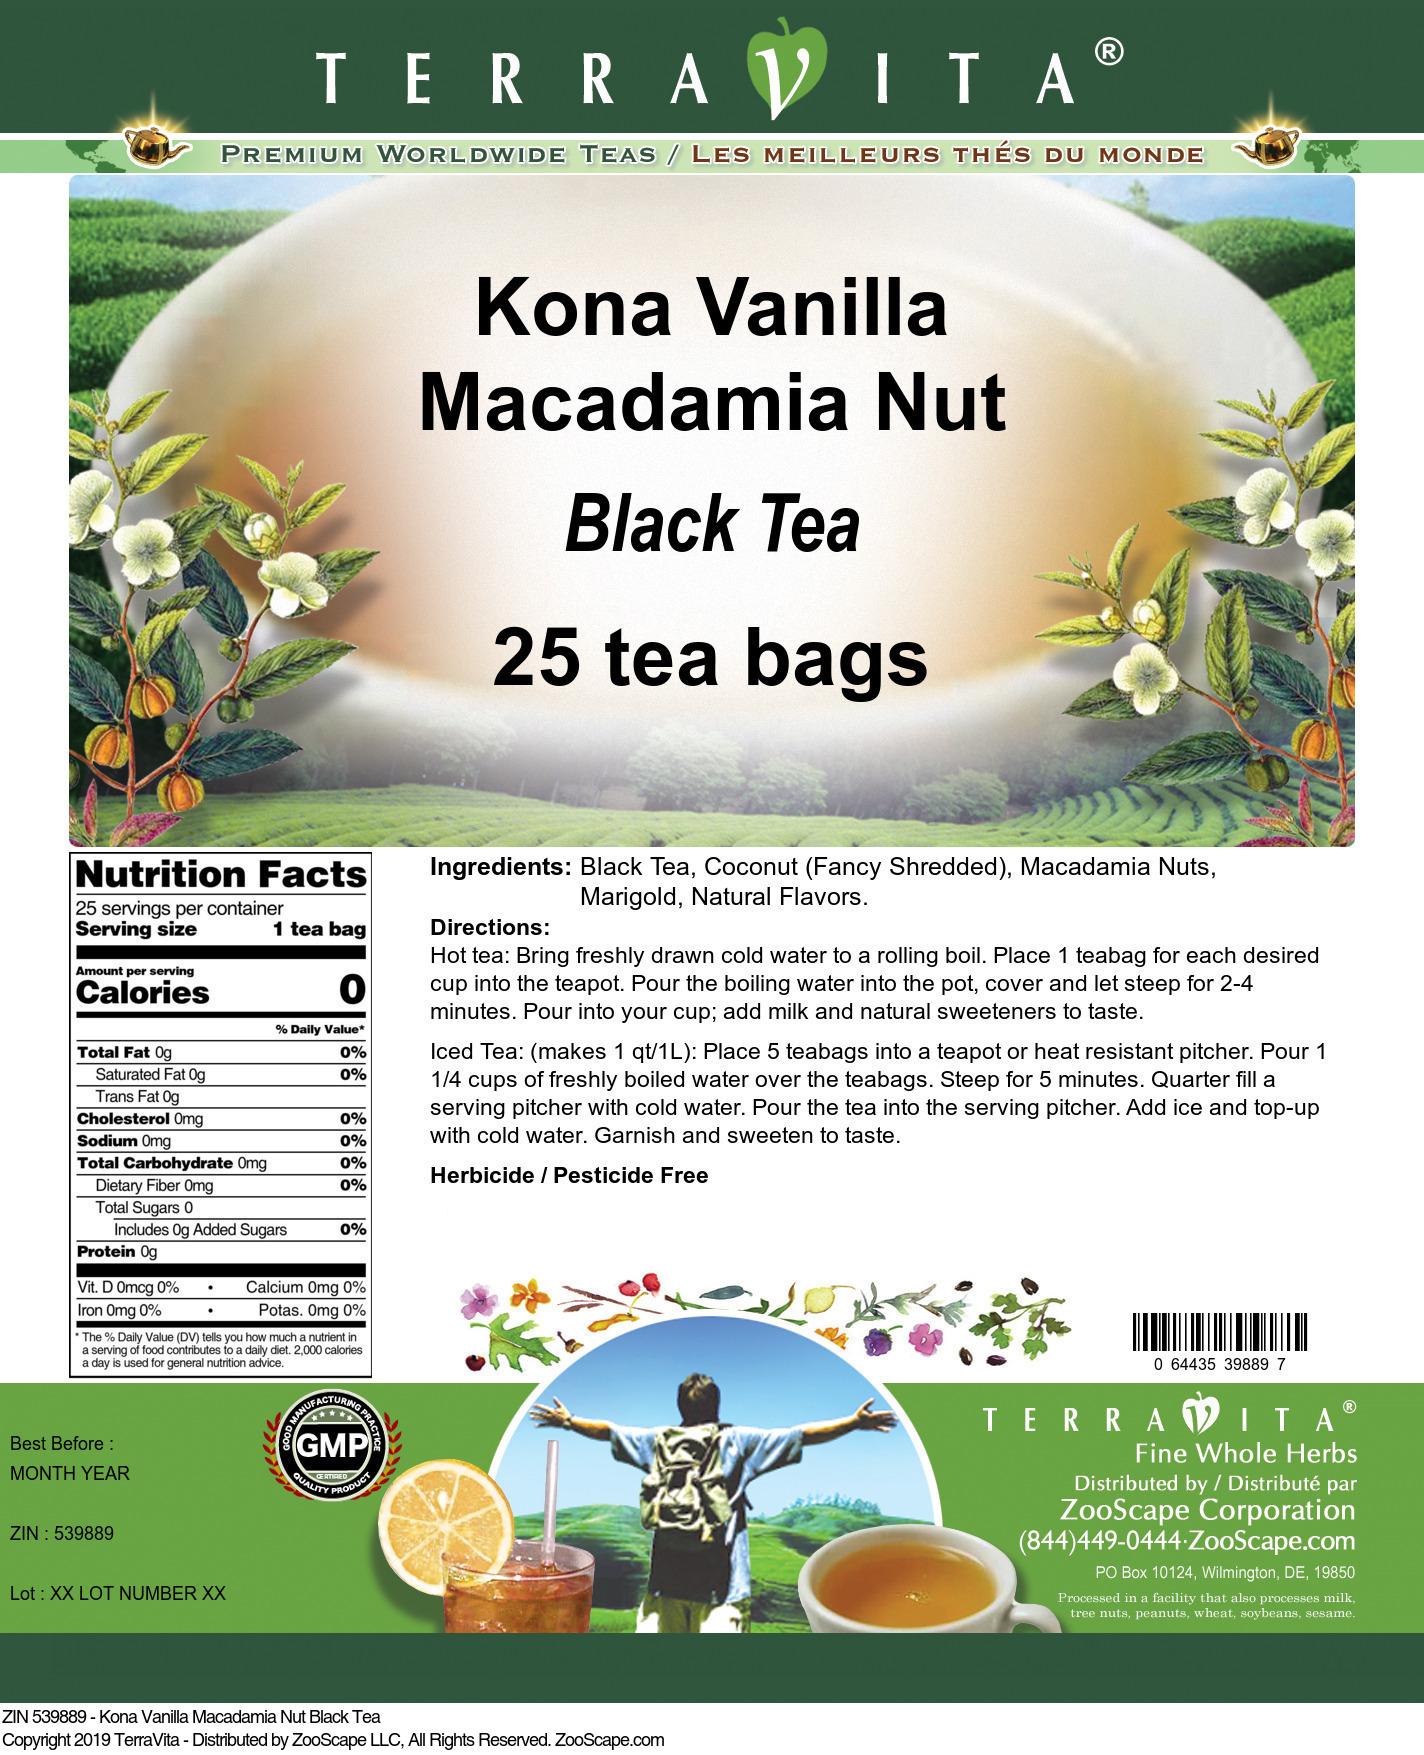 Kona Vanilla Macadamia Nut Black Tea